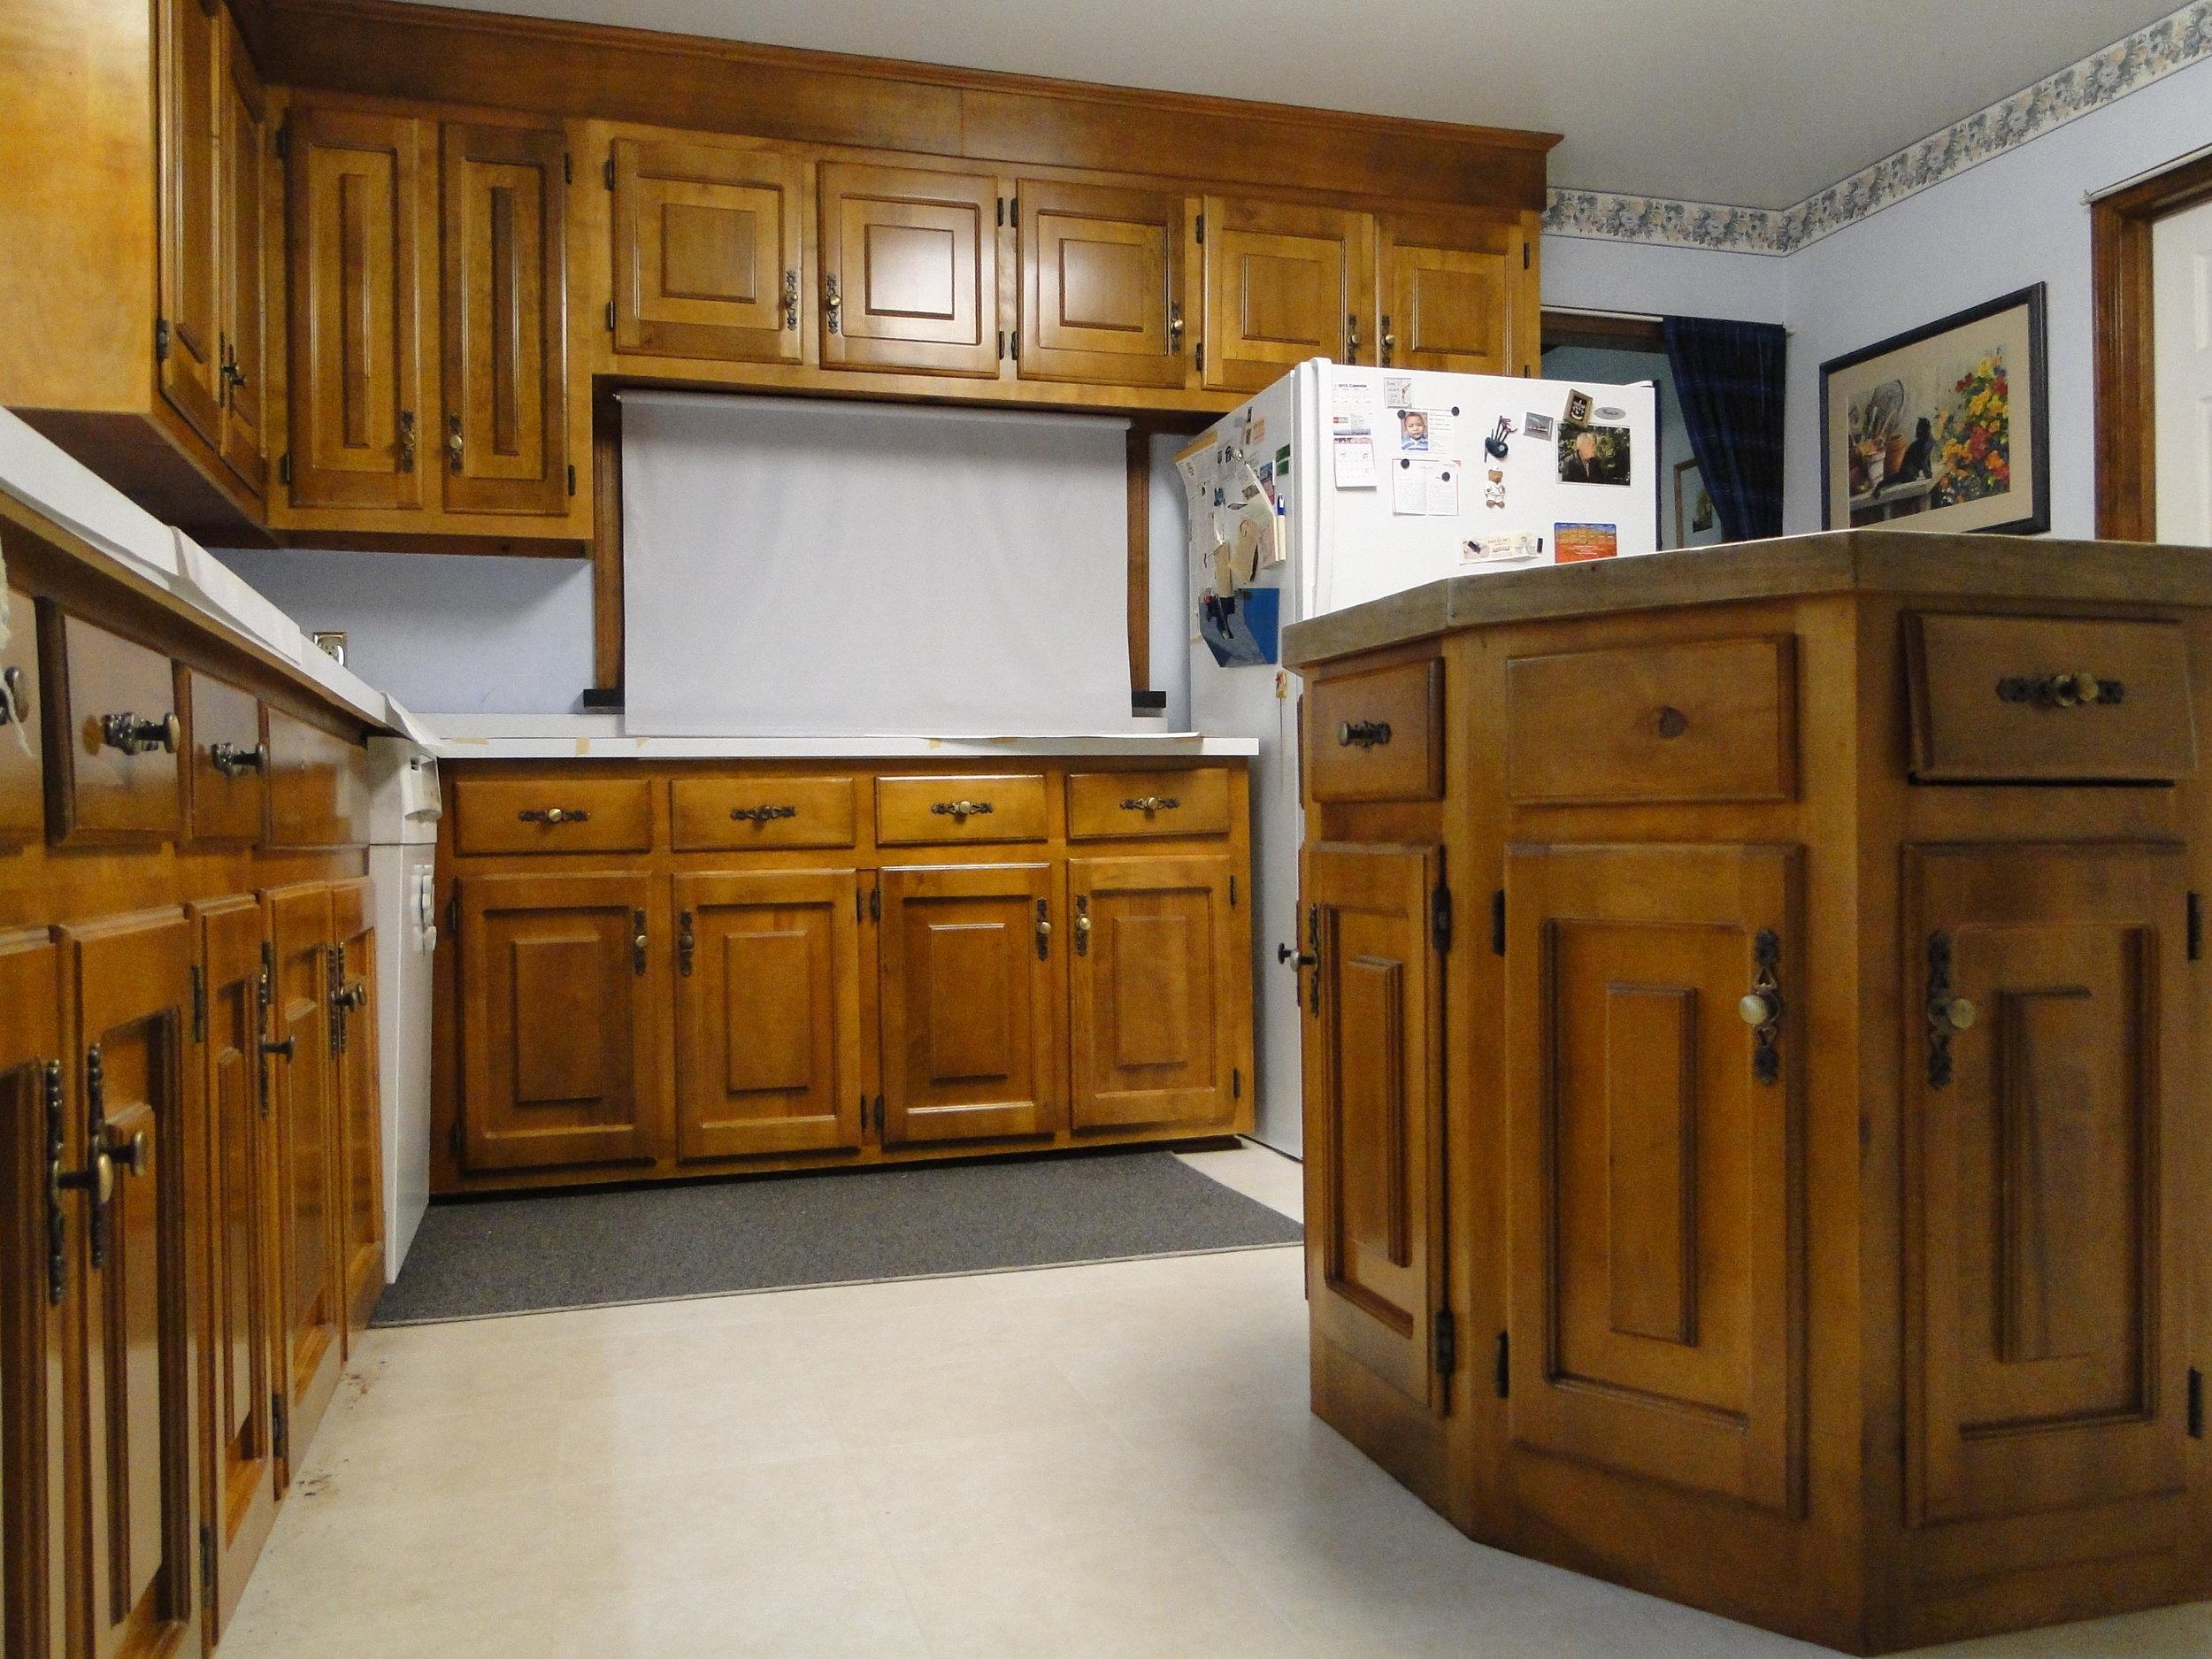 Cabinet Restoration Painting Old Peg Furniture Services